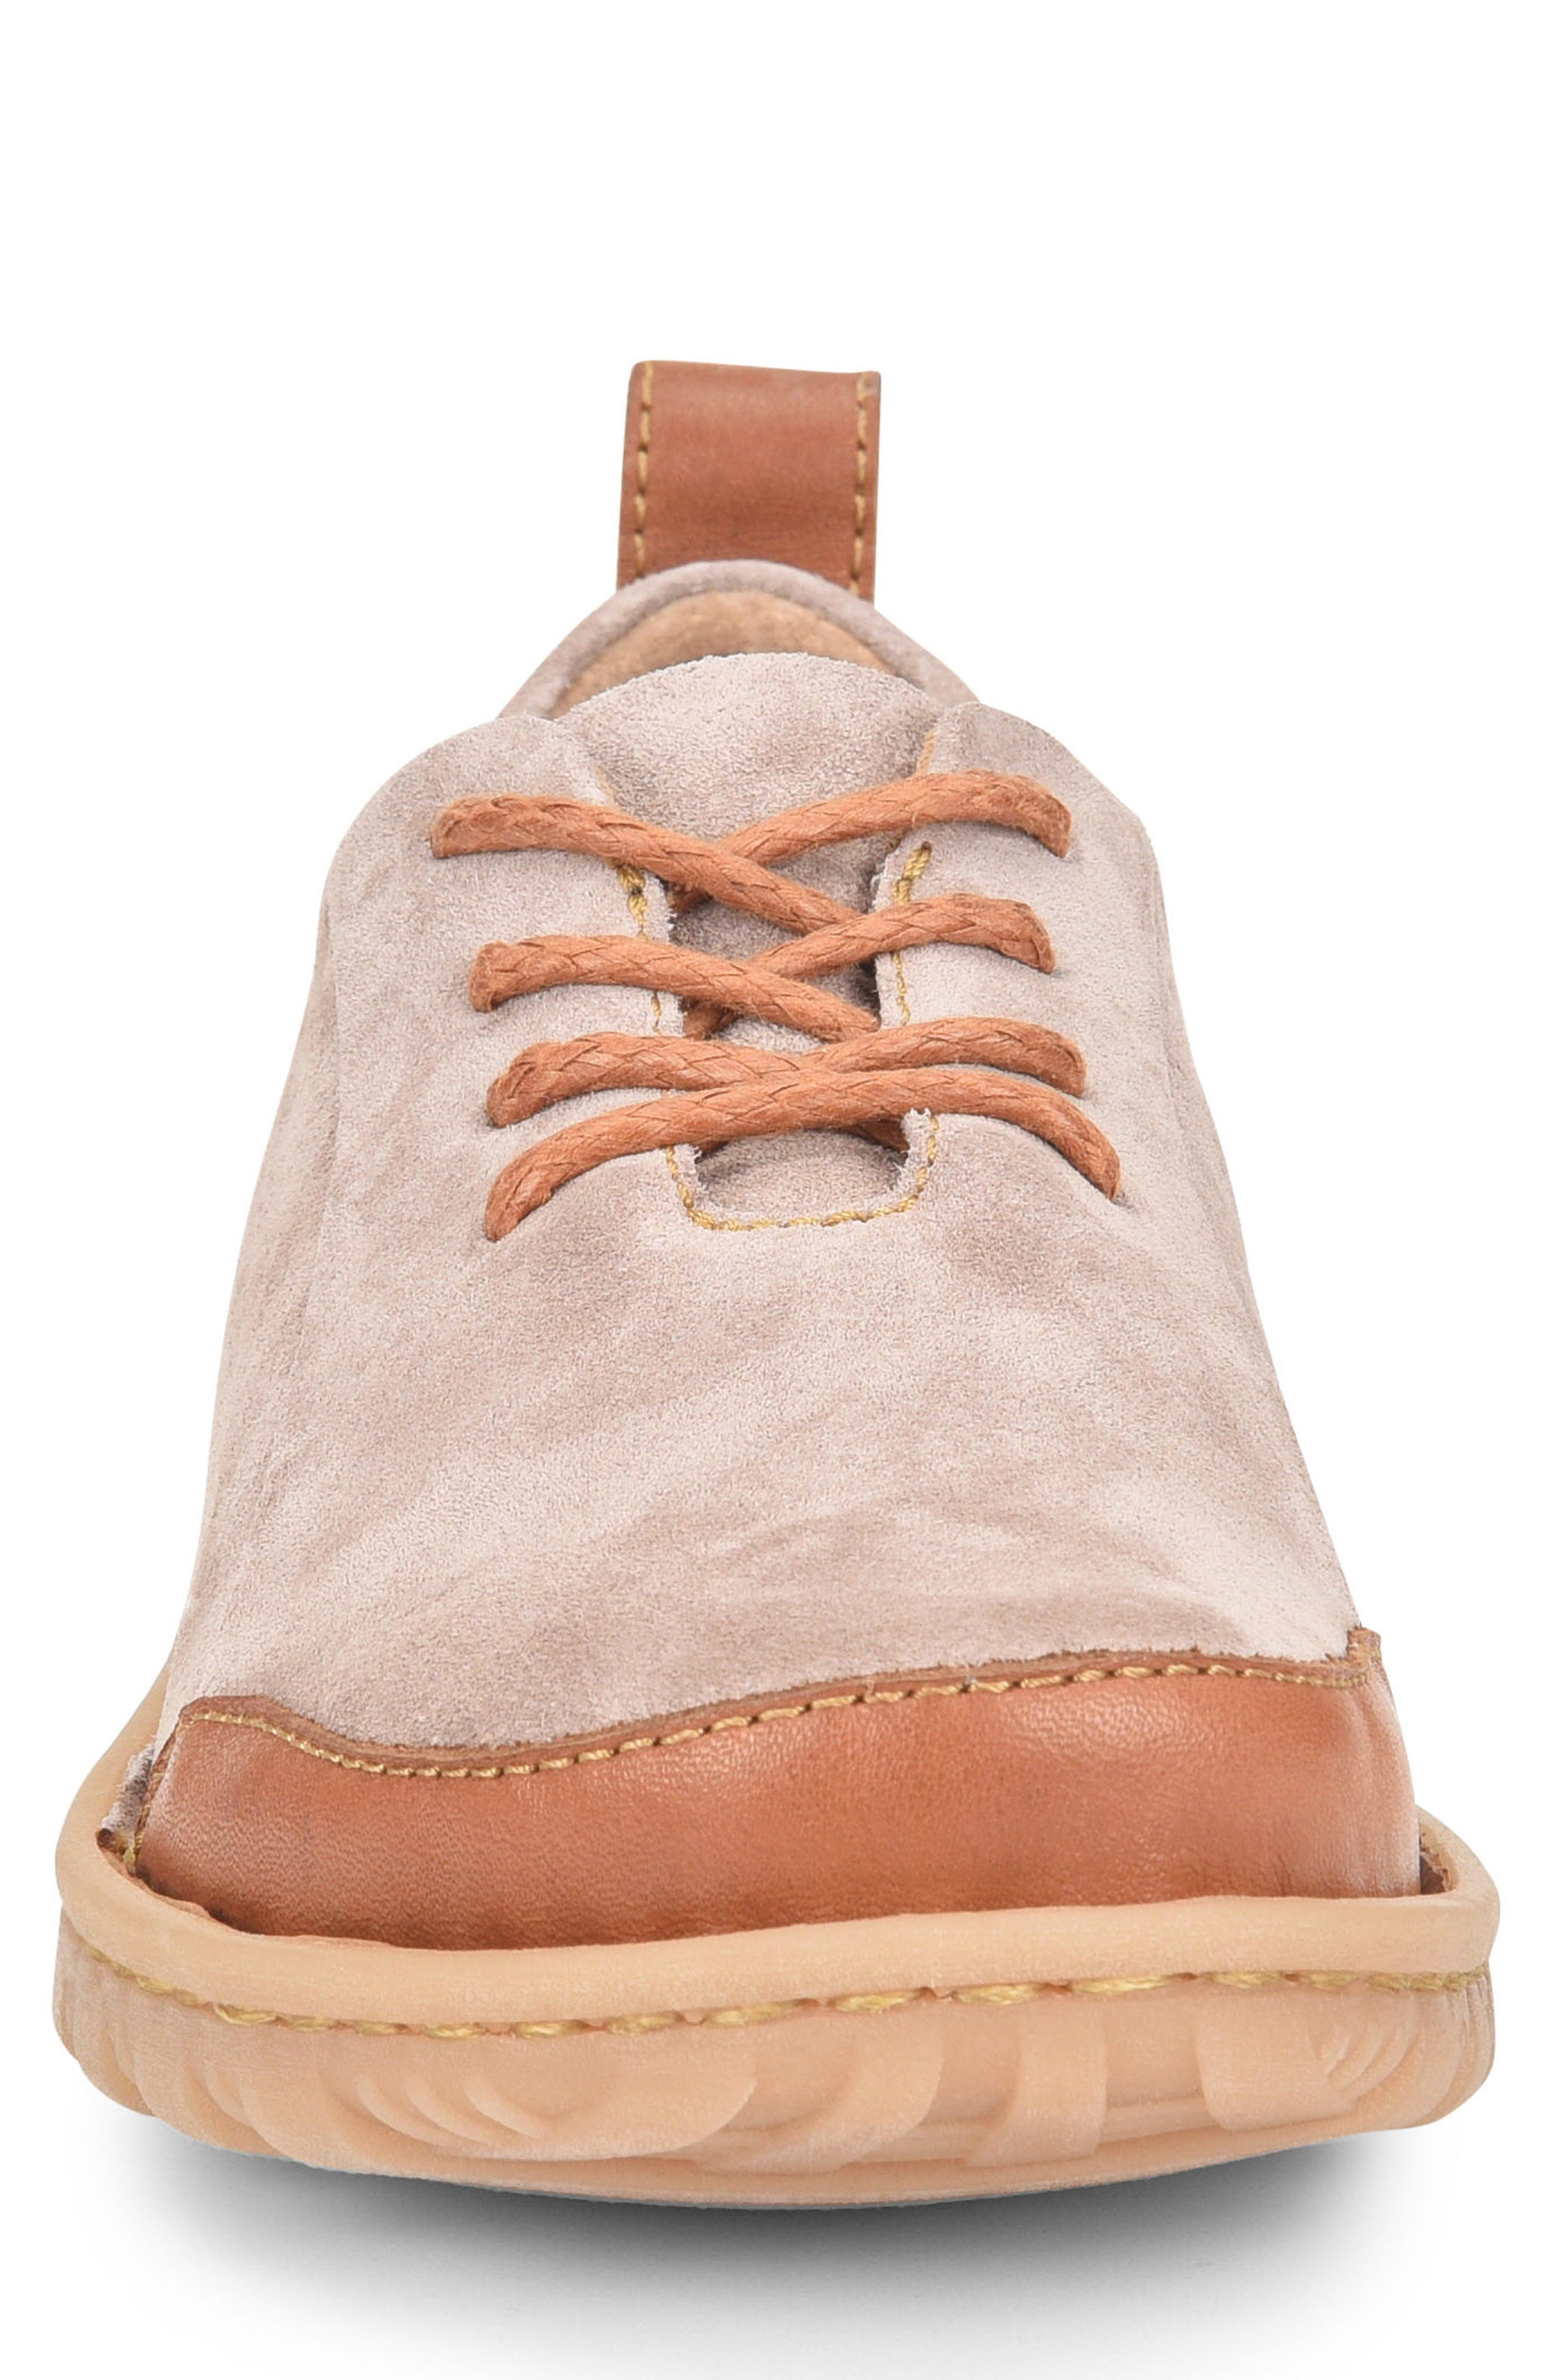 Piper Plain Toe Derby,                             Alternate thumbnail 4, color,                             Grey/ Bronze Leather